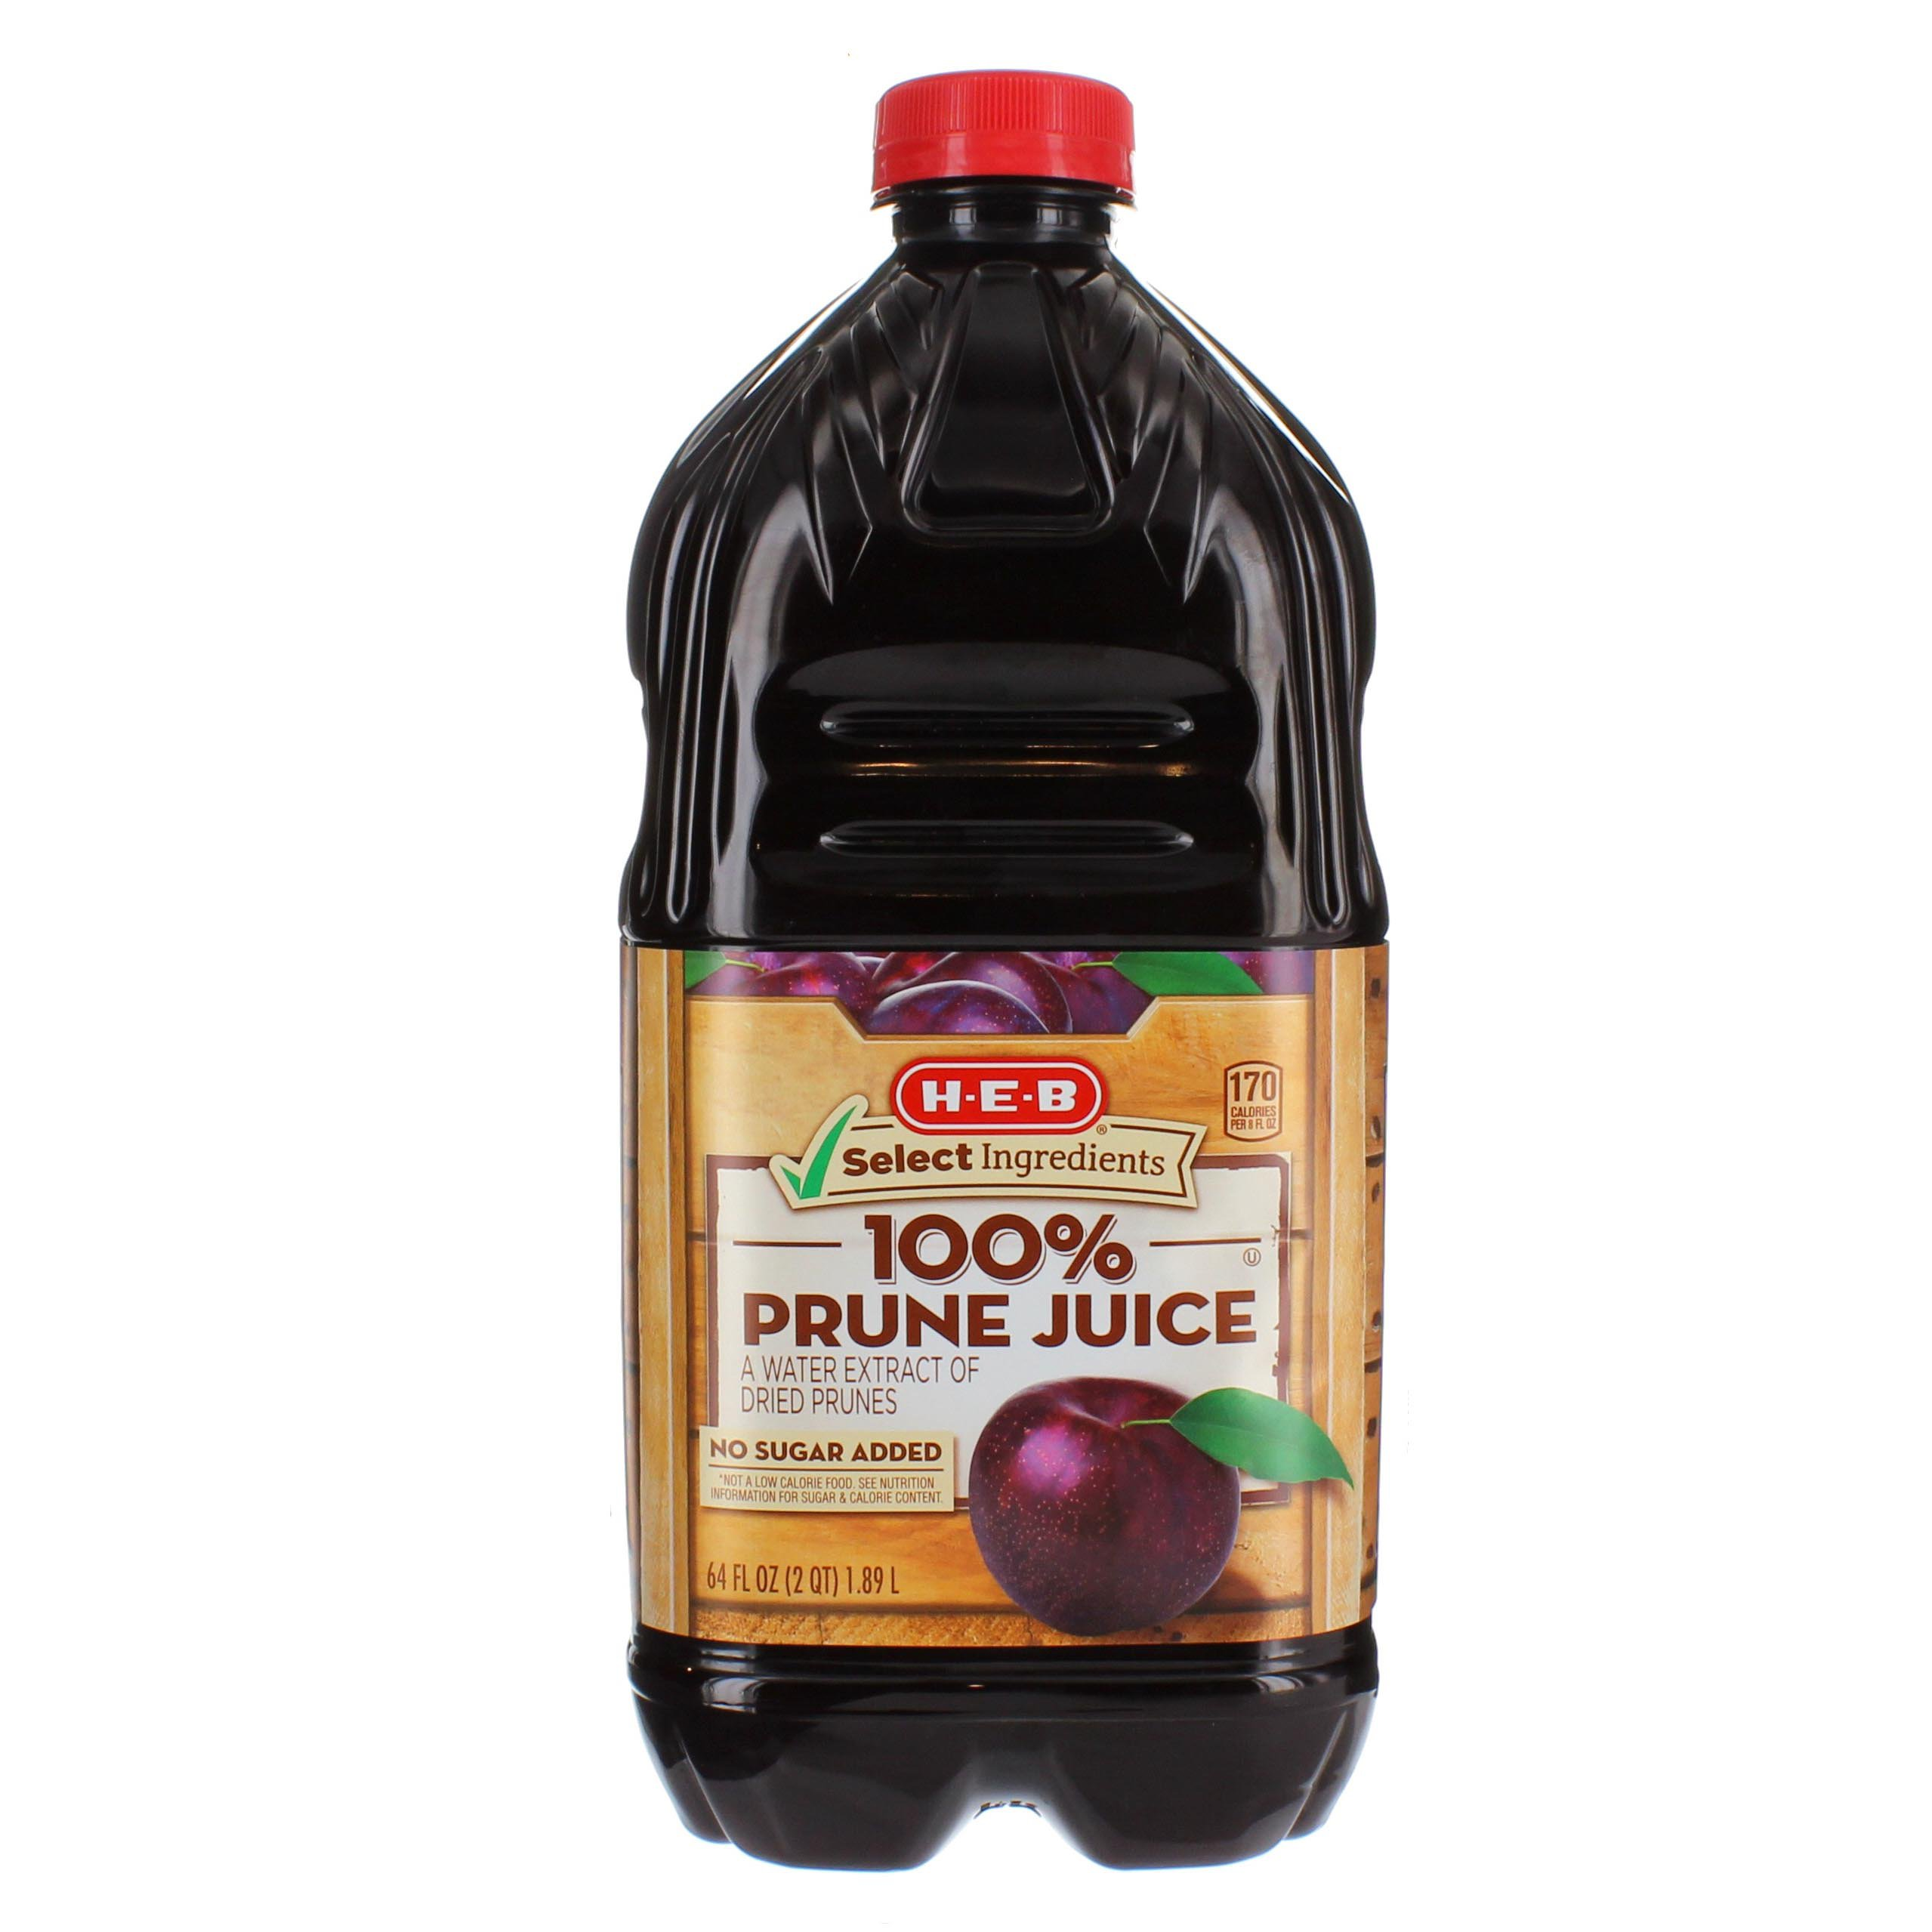 H E B Select Ingredients 100 Prune Juice Shop Juice At H E B